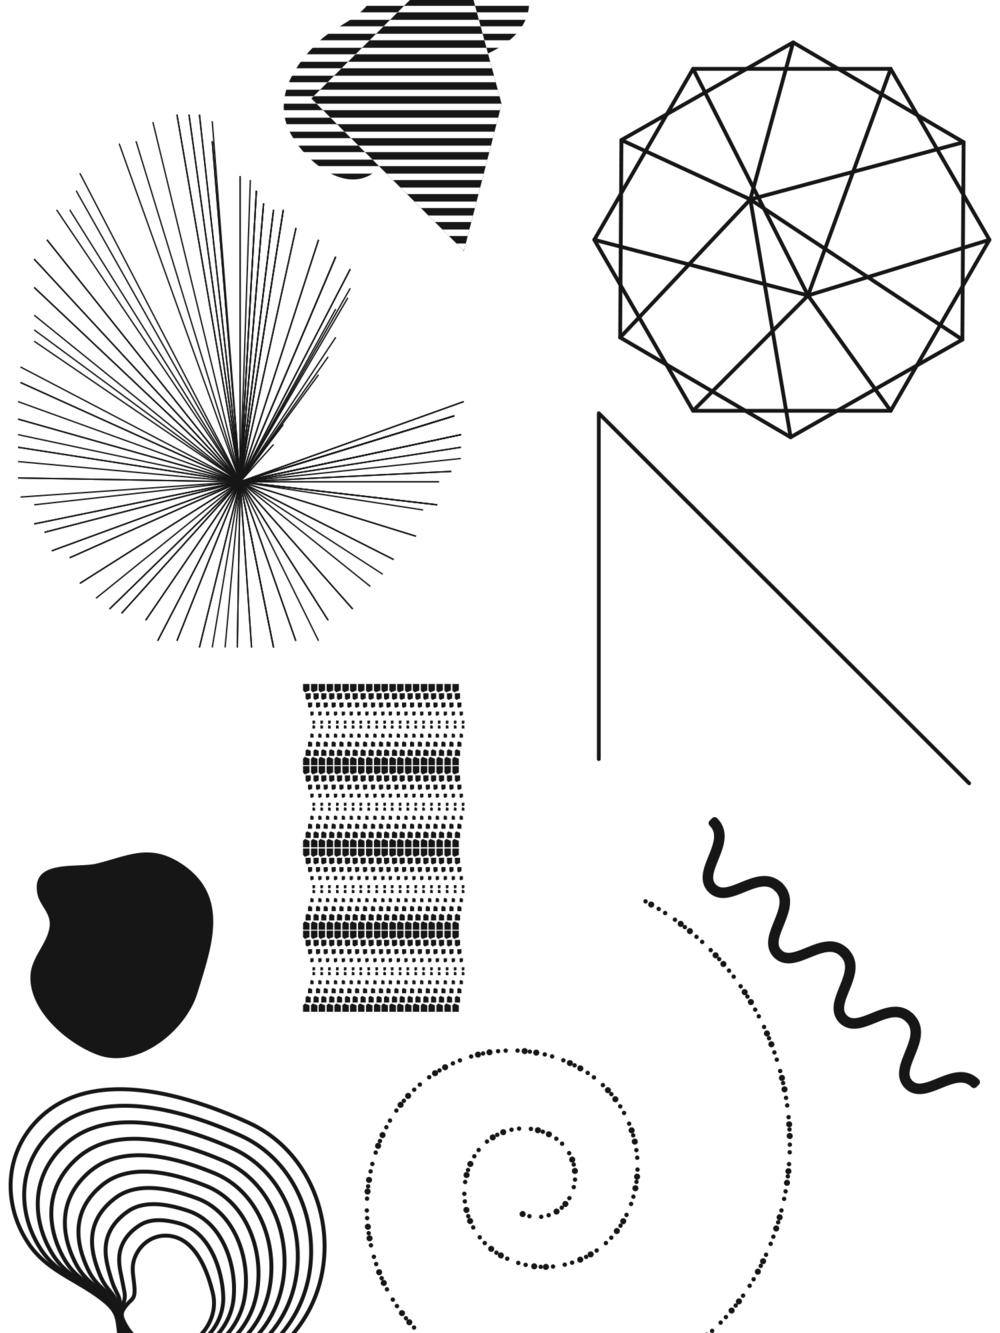 au-artcrank16-sketch3.jpg